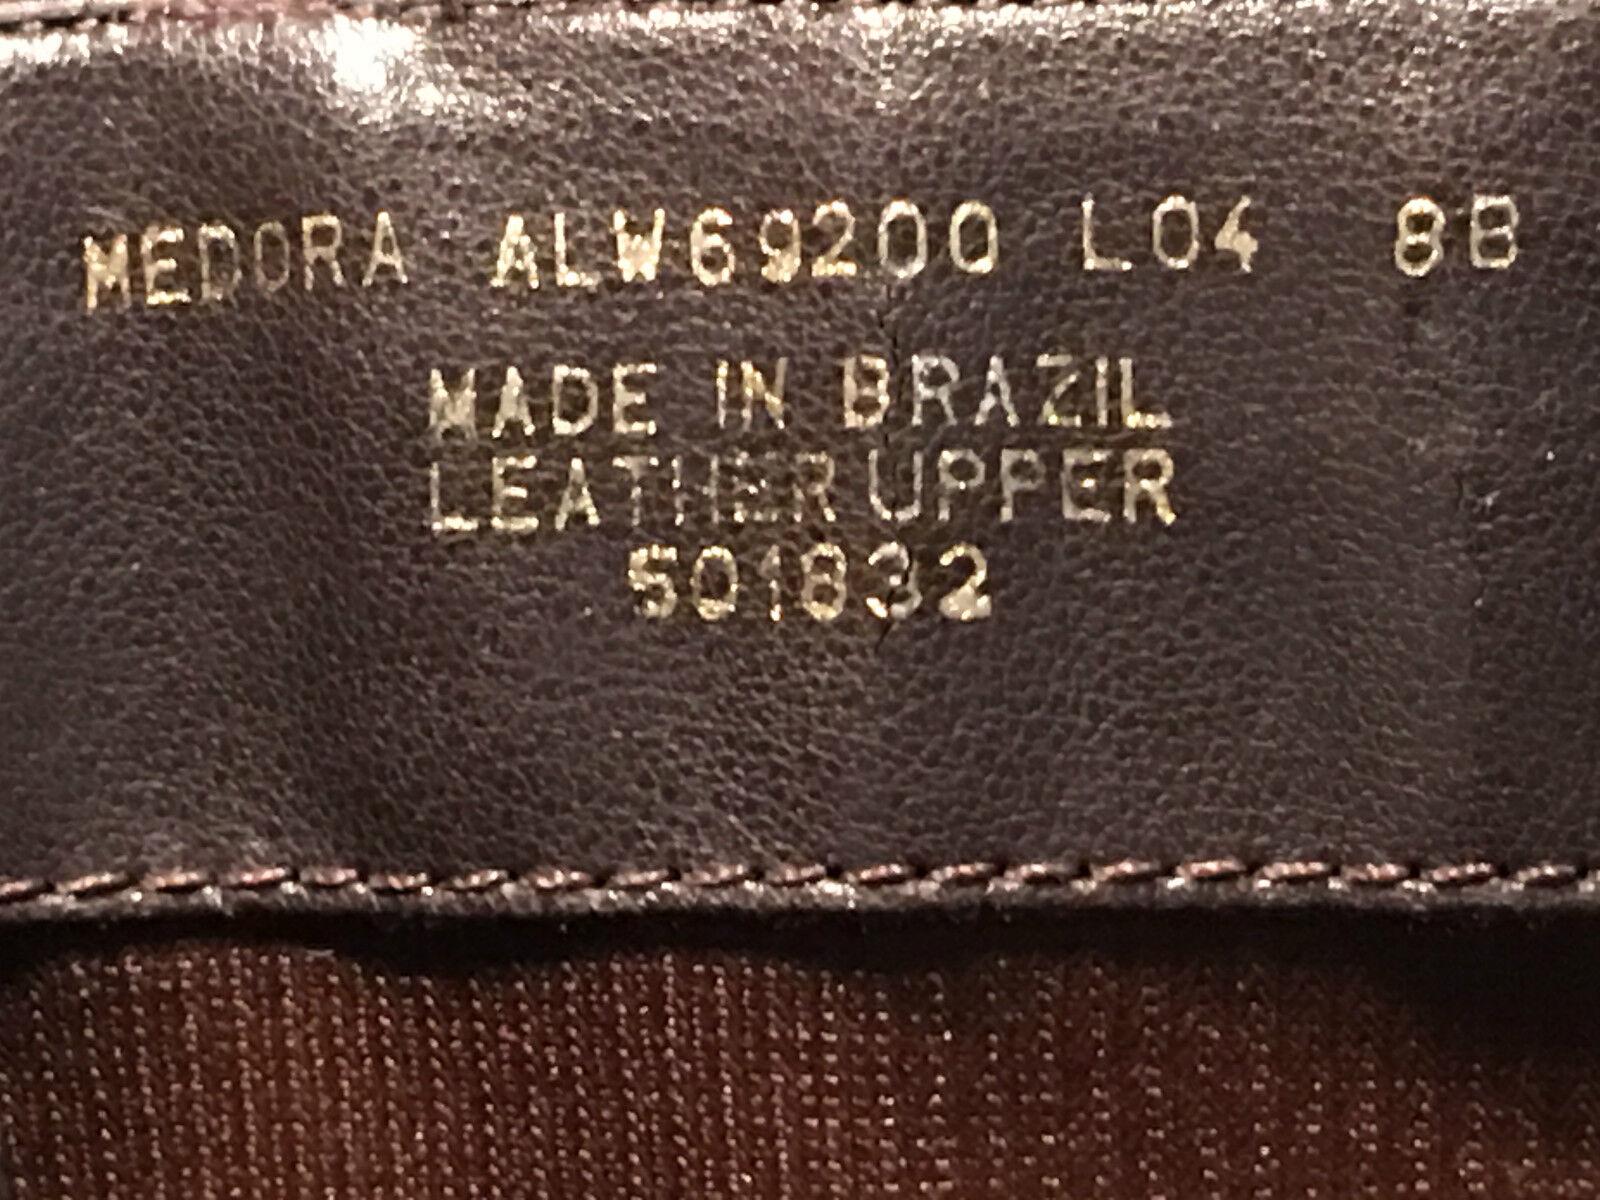 Ralph Lauren Lauren Lauren Medora Jirafa Imprimir Pantorrilla Bota al tobillo de Pelo para Mujer Talla 8 EE. UU. 9a94c2